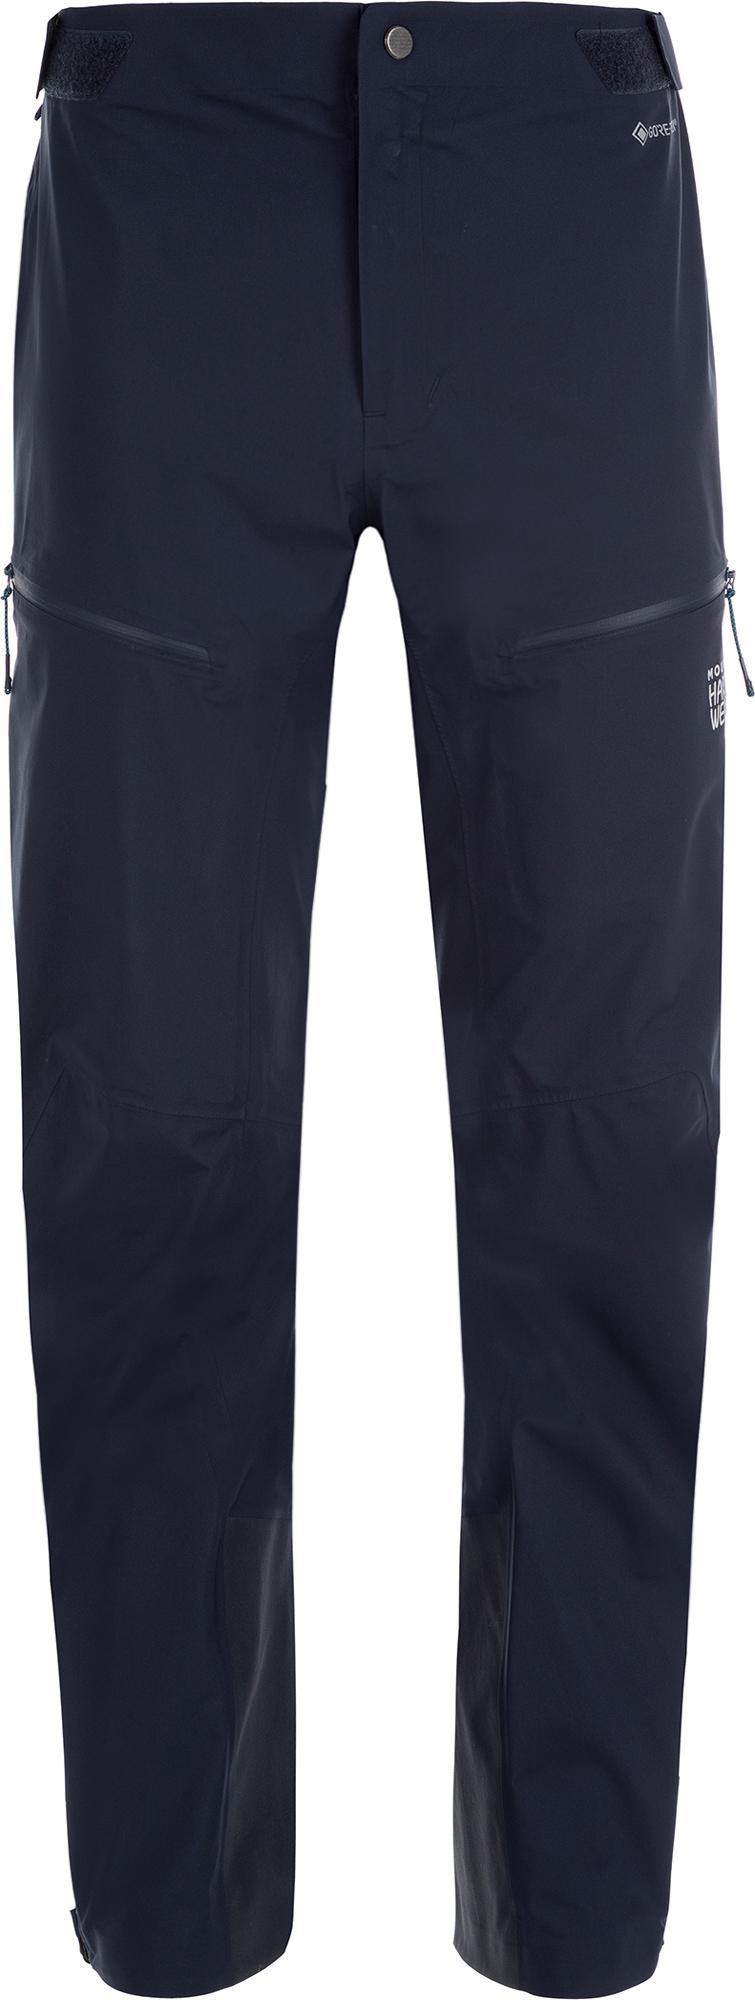 Mountain Hardwear Брюки мужские Hardwear, размер 54